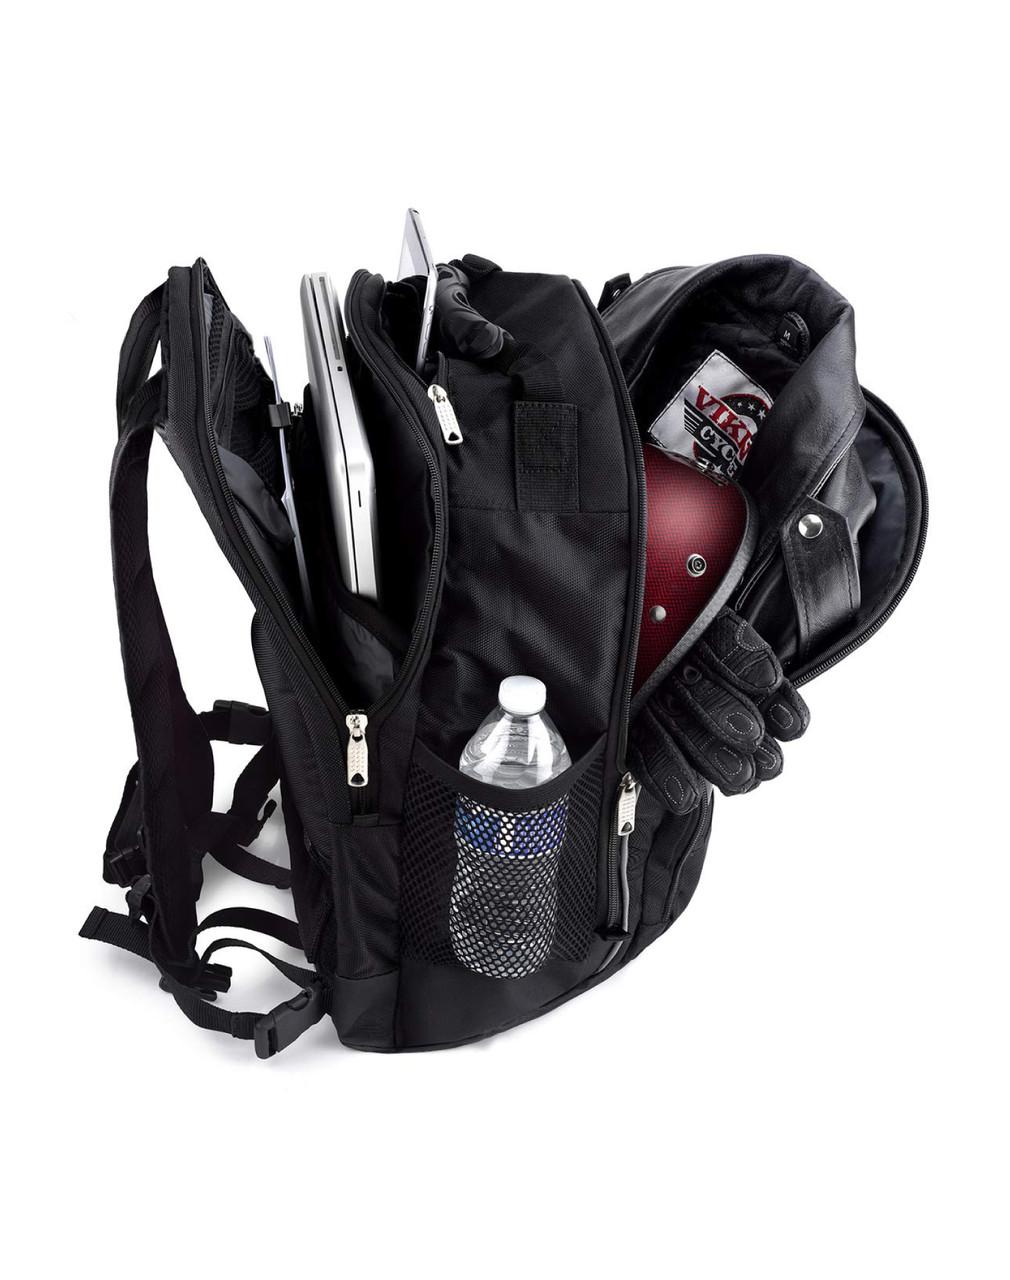 Honda Viking Motorcycle Sissy Bar Backpack Carrying Items View